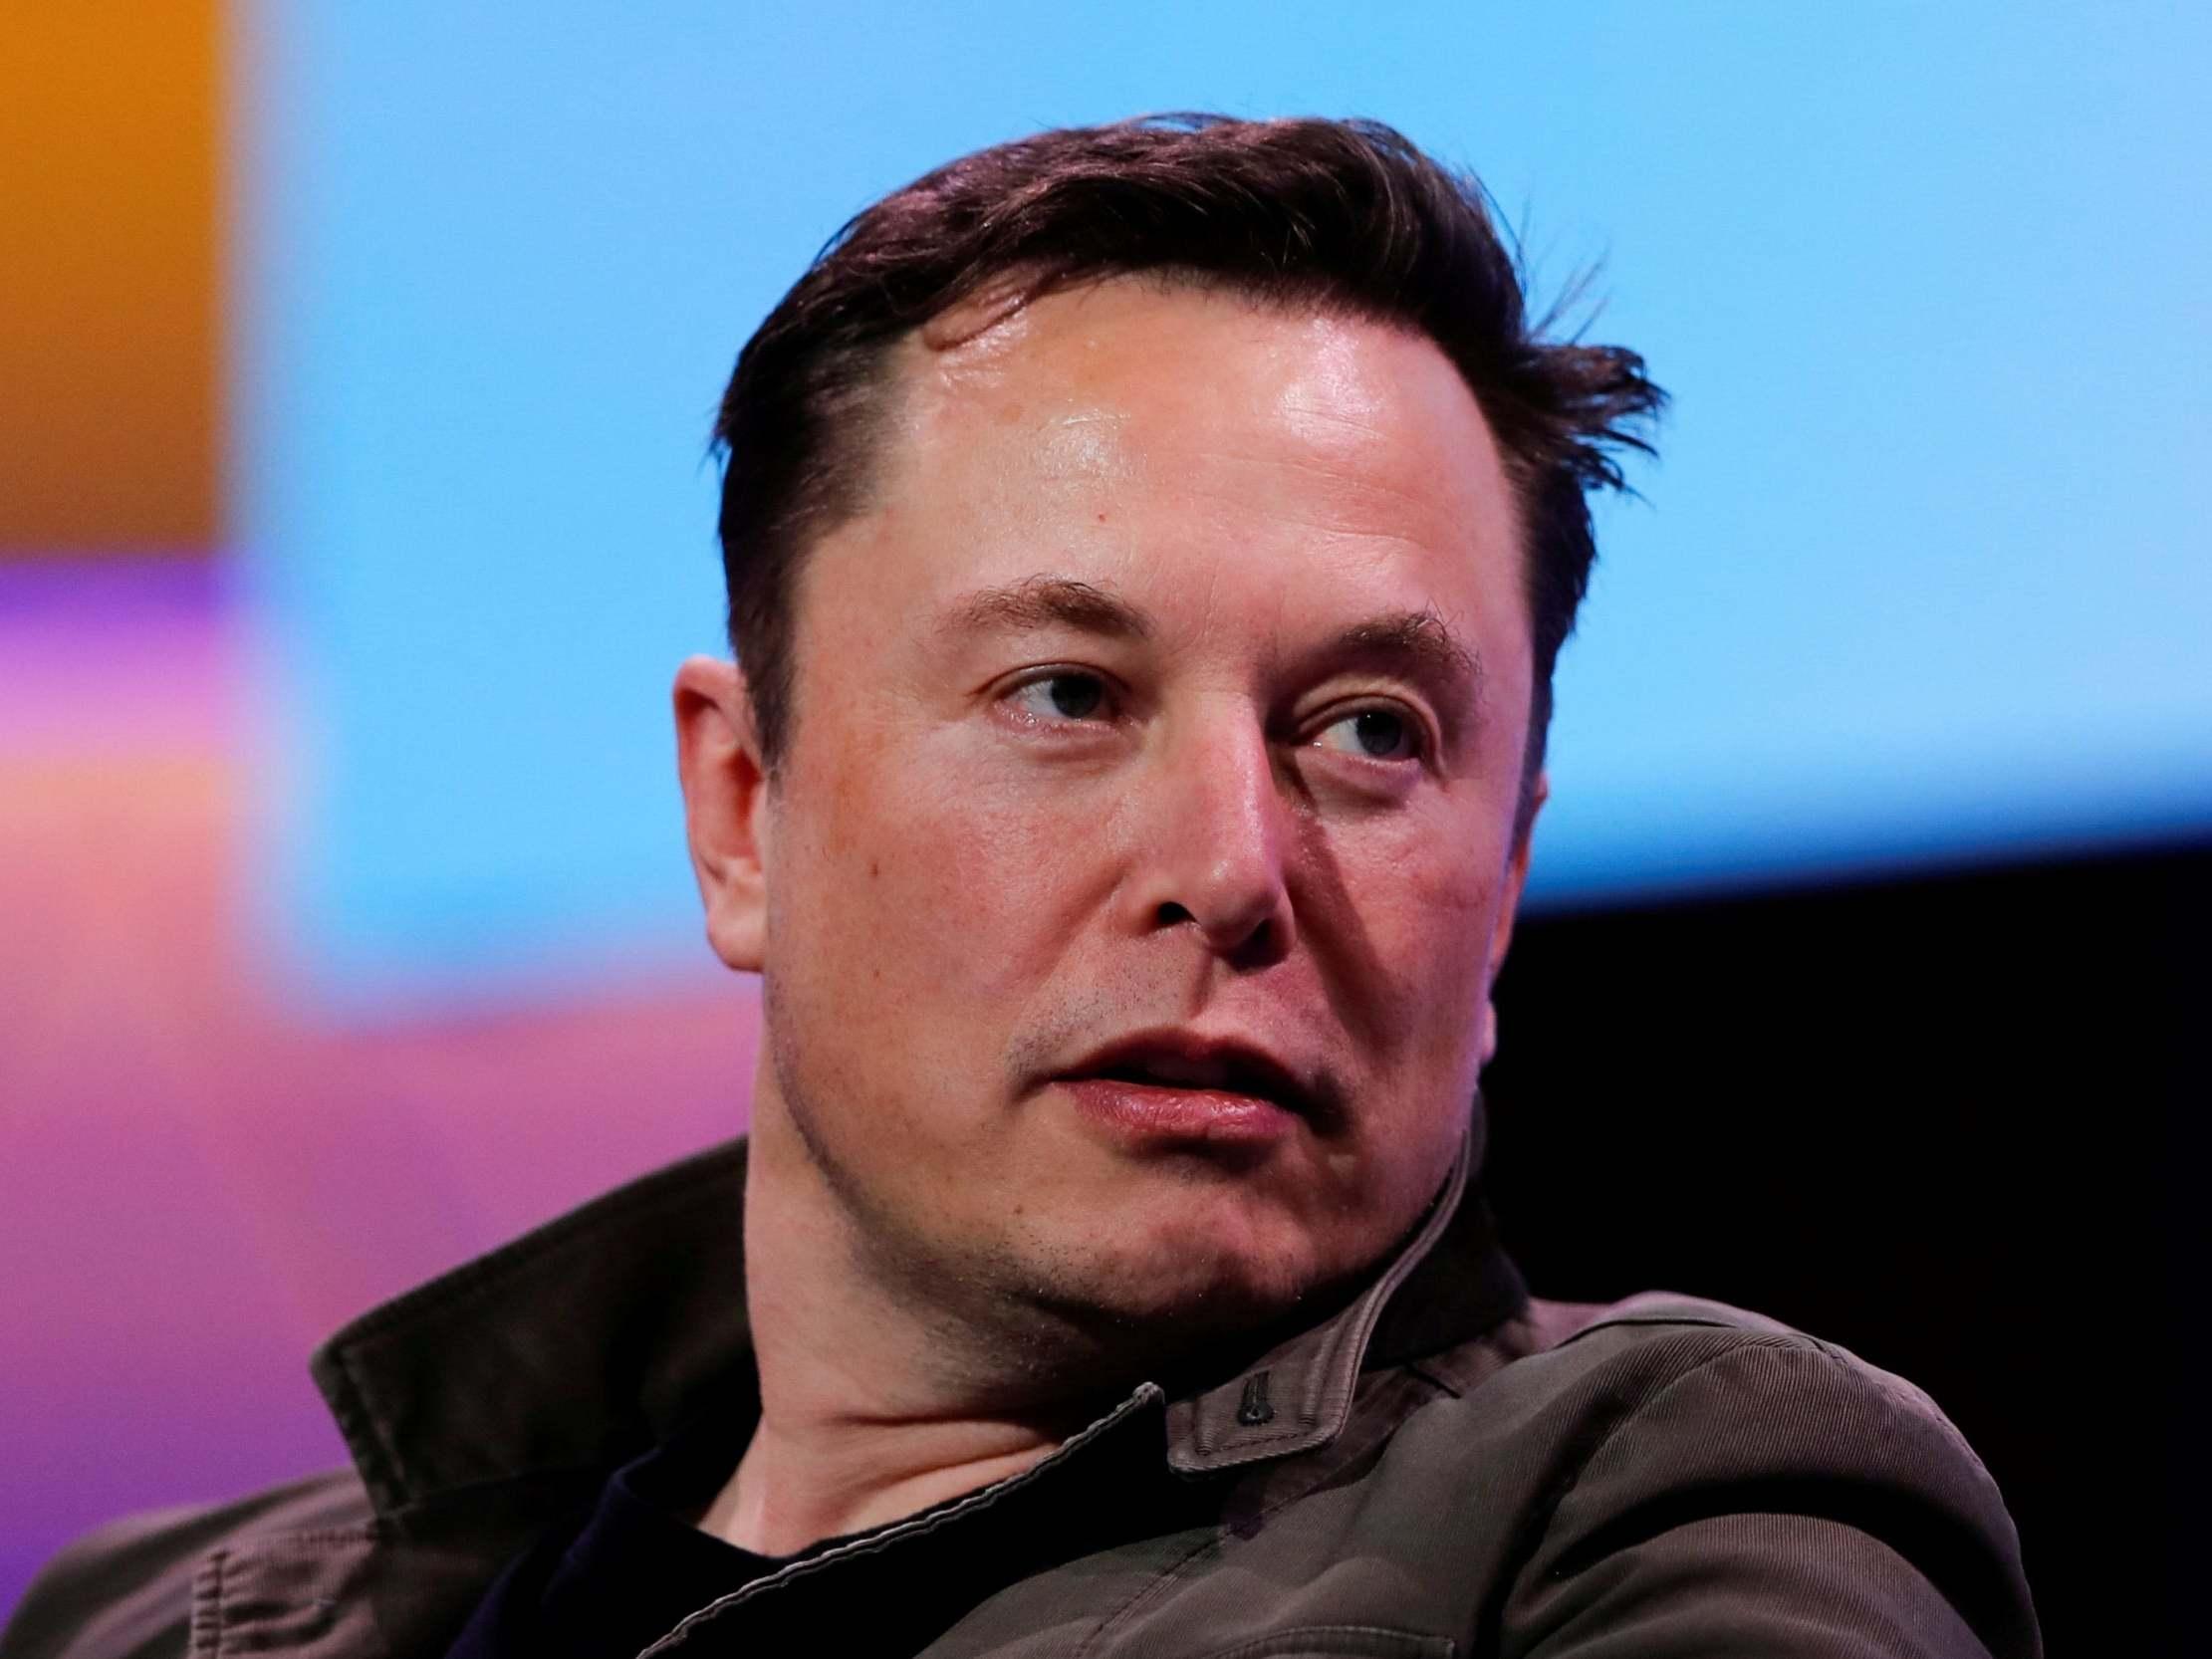 Elon Musk Offers $100 Million for Best Carbon Capture Tech